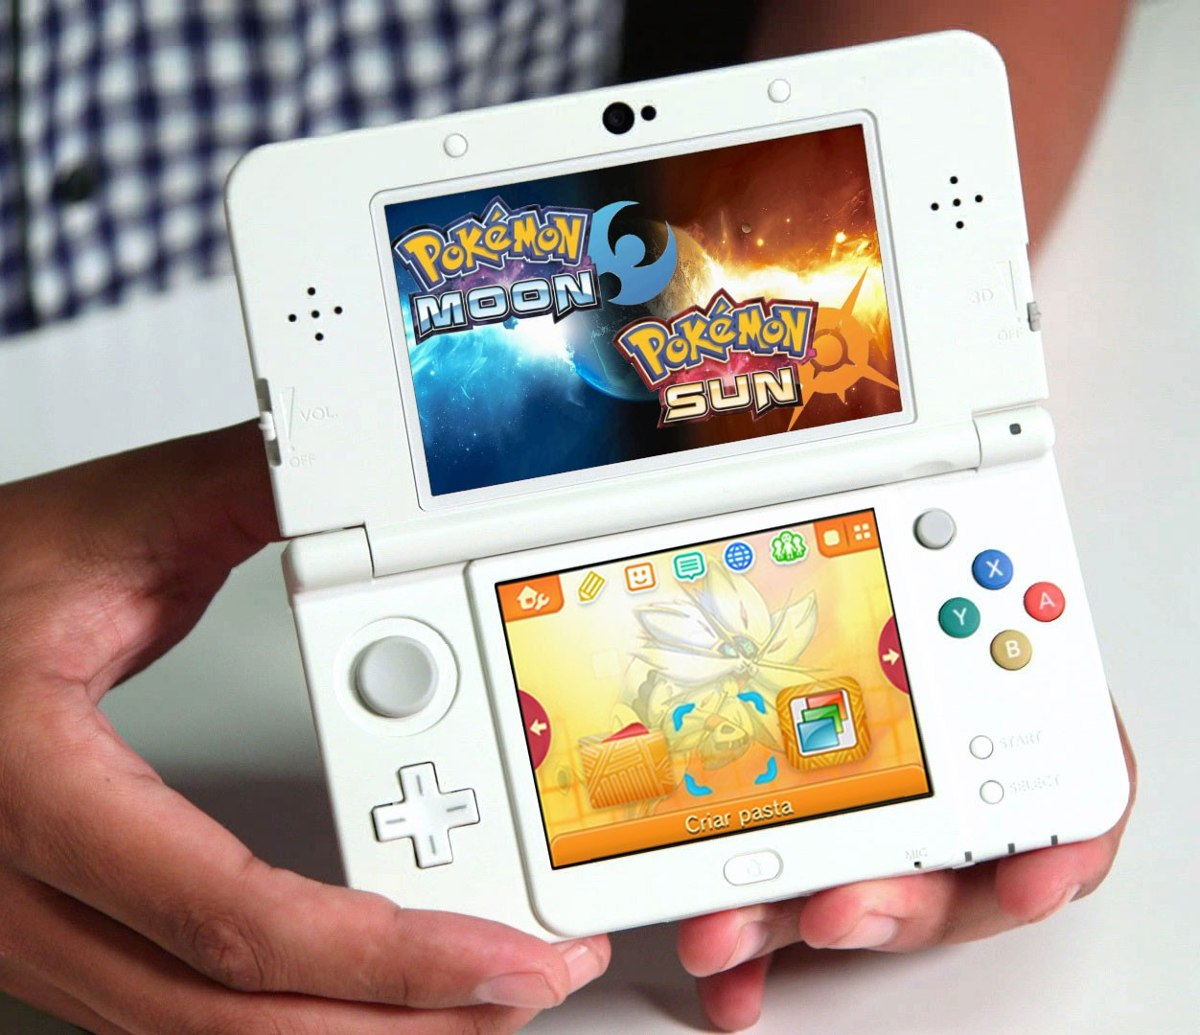 how to find pokemon iv on pokemon sun